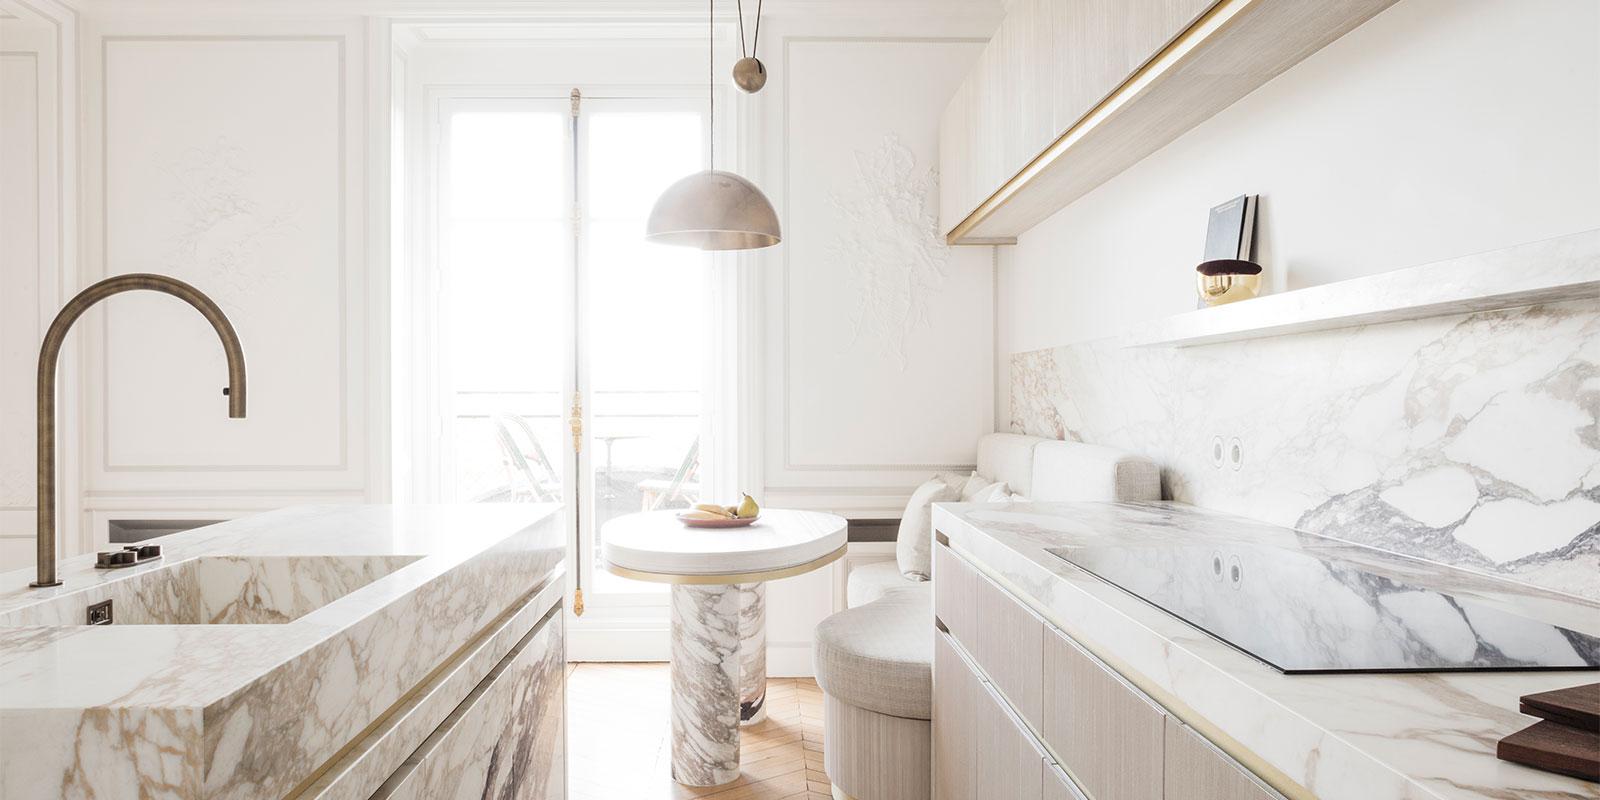 Signature keukens van Obumex, Obumex, maatwerk keukens, wit